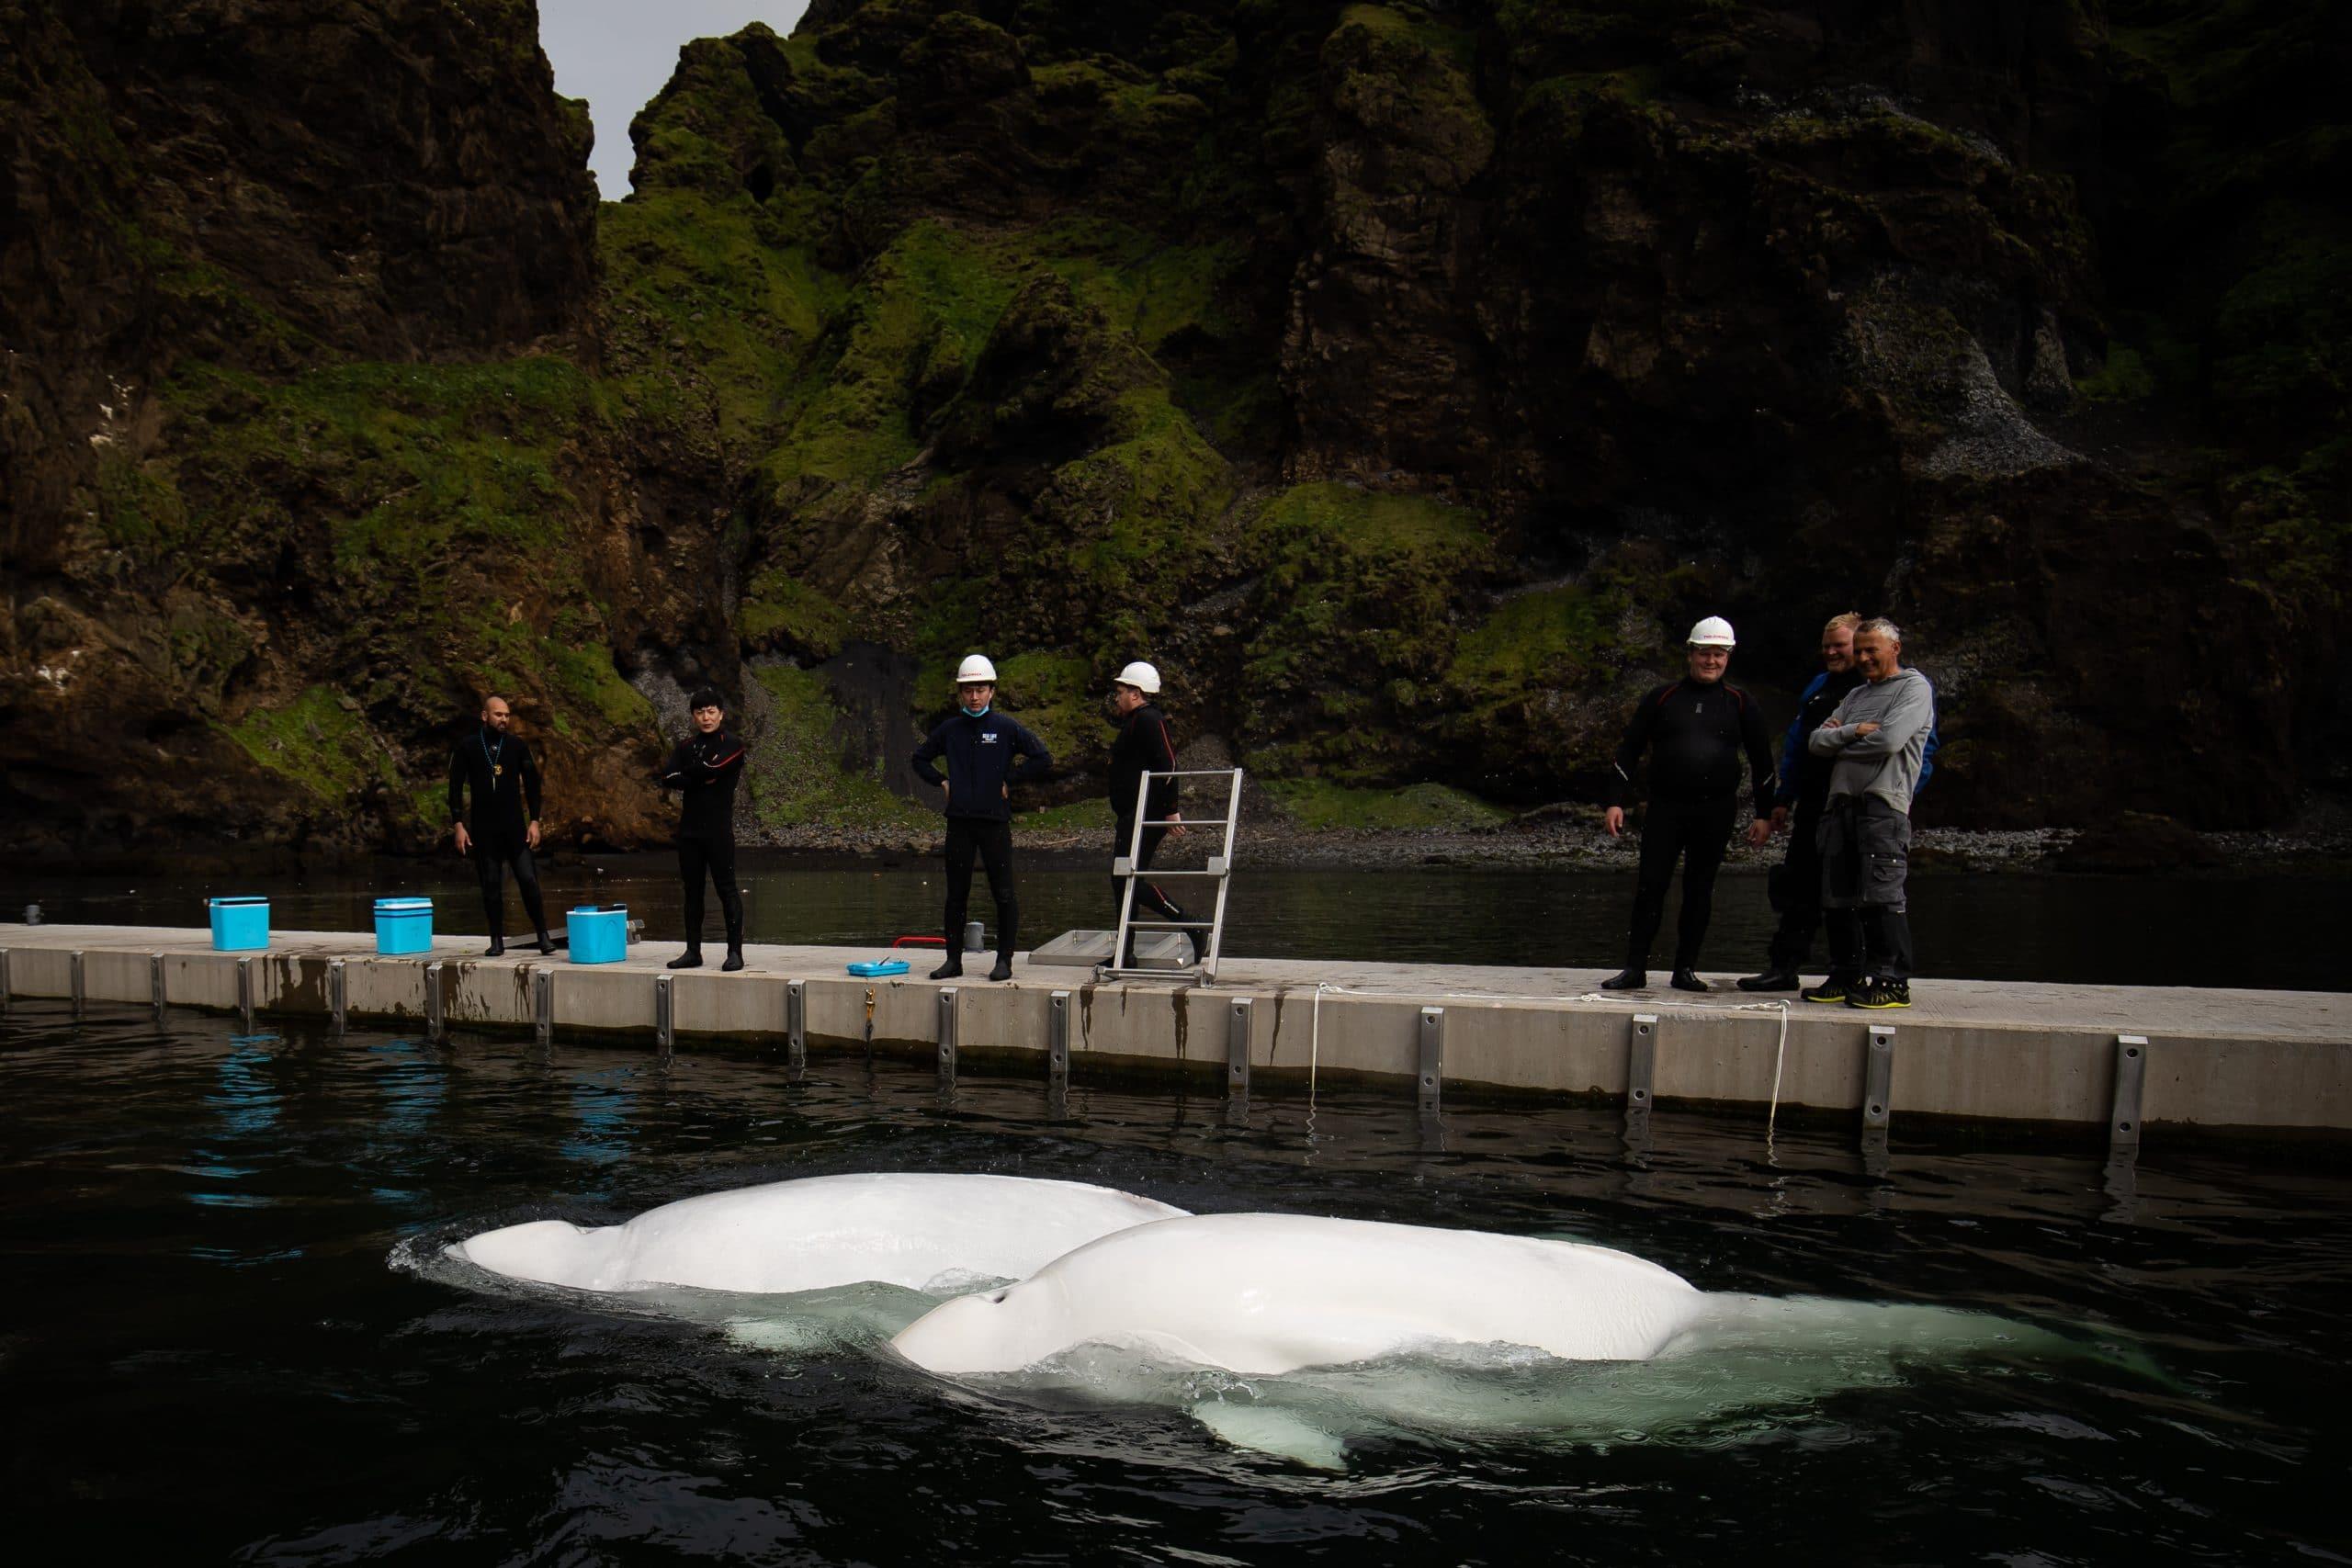 Die beiden Belugas im Pflegebecken ihres neuen Meeresrefugiums. (C) SEA LIFE TRUST